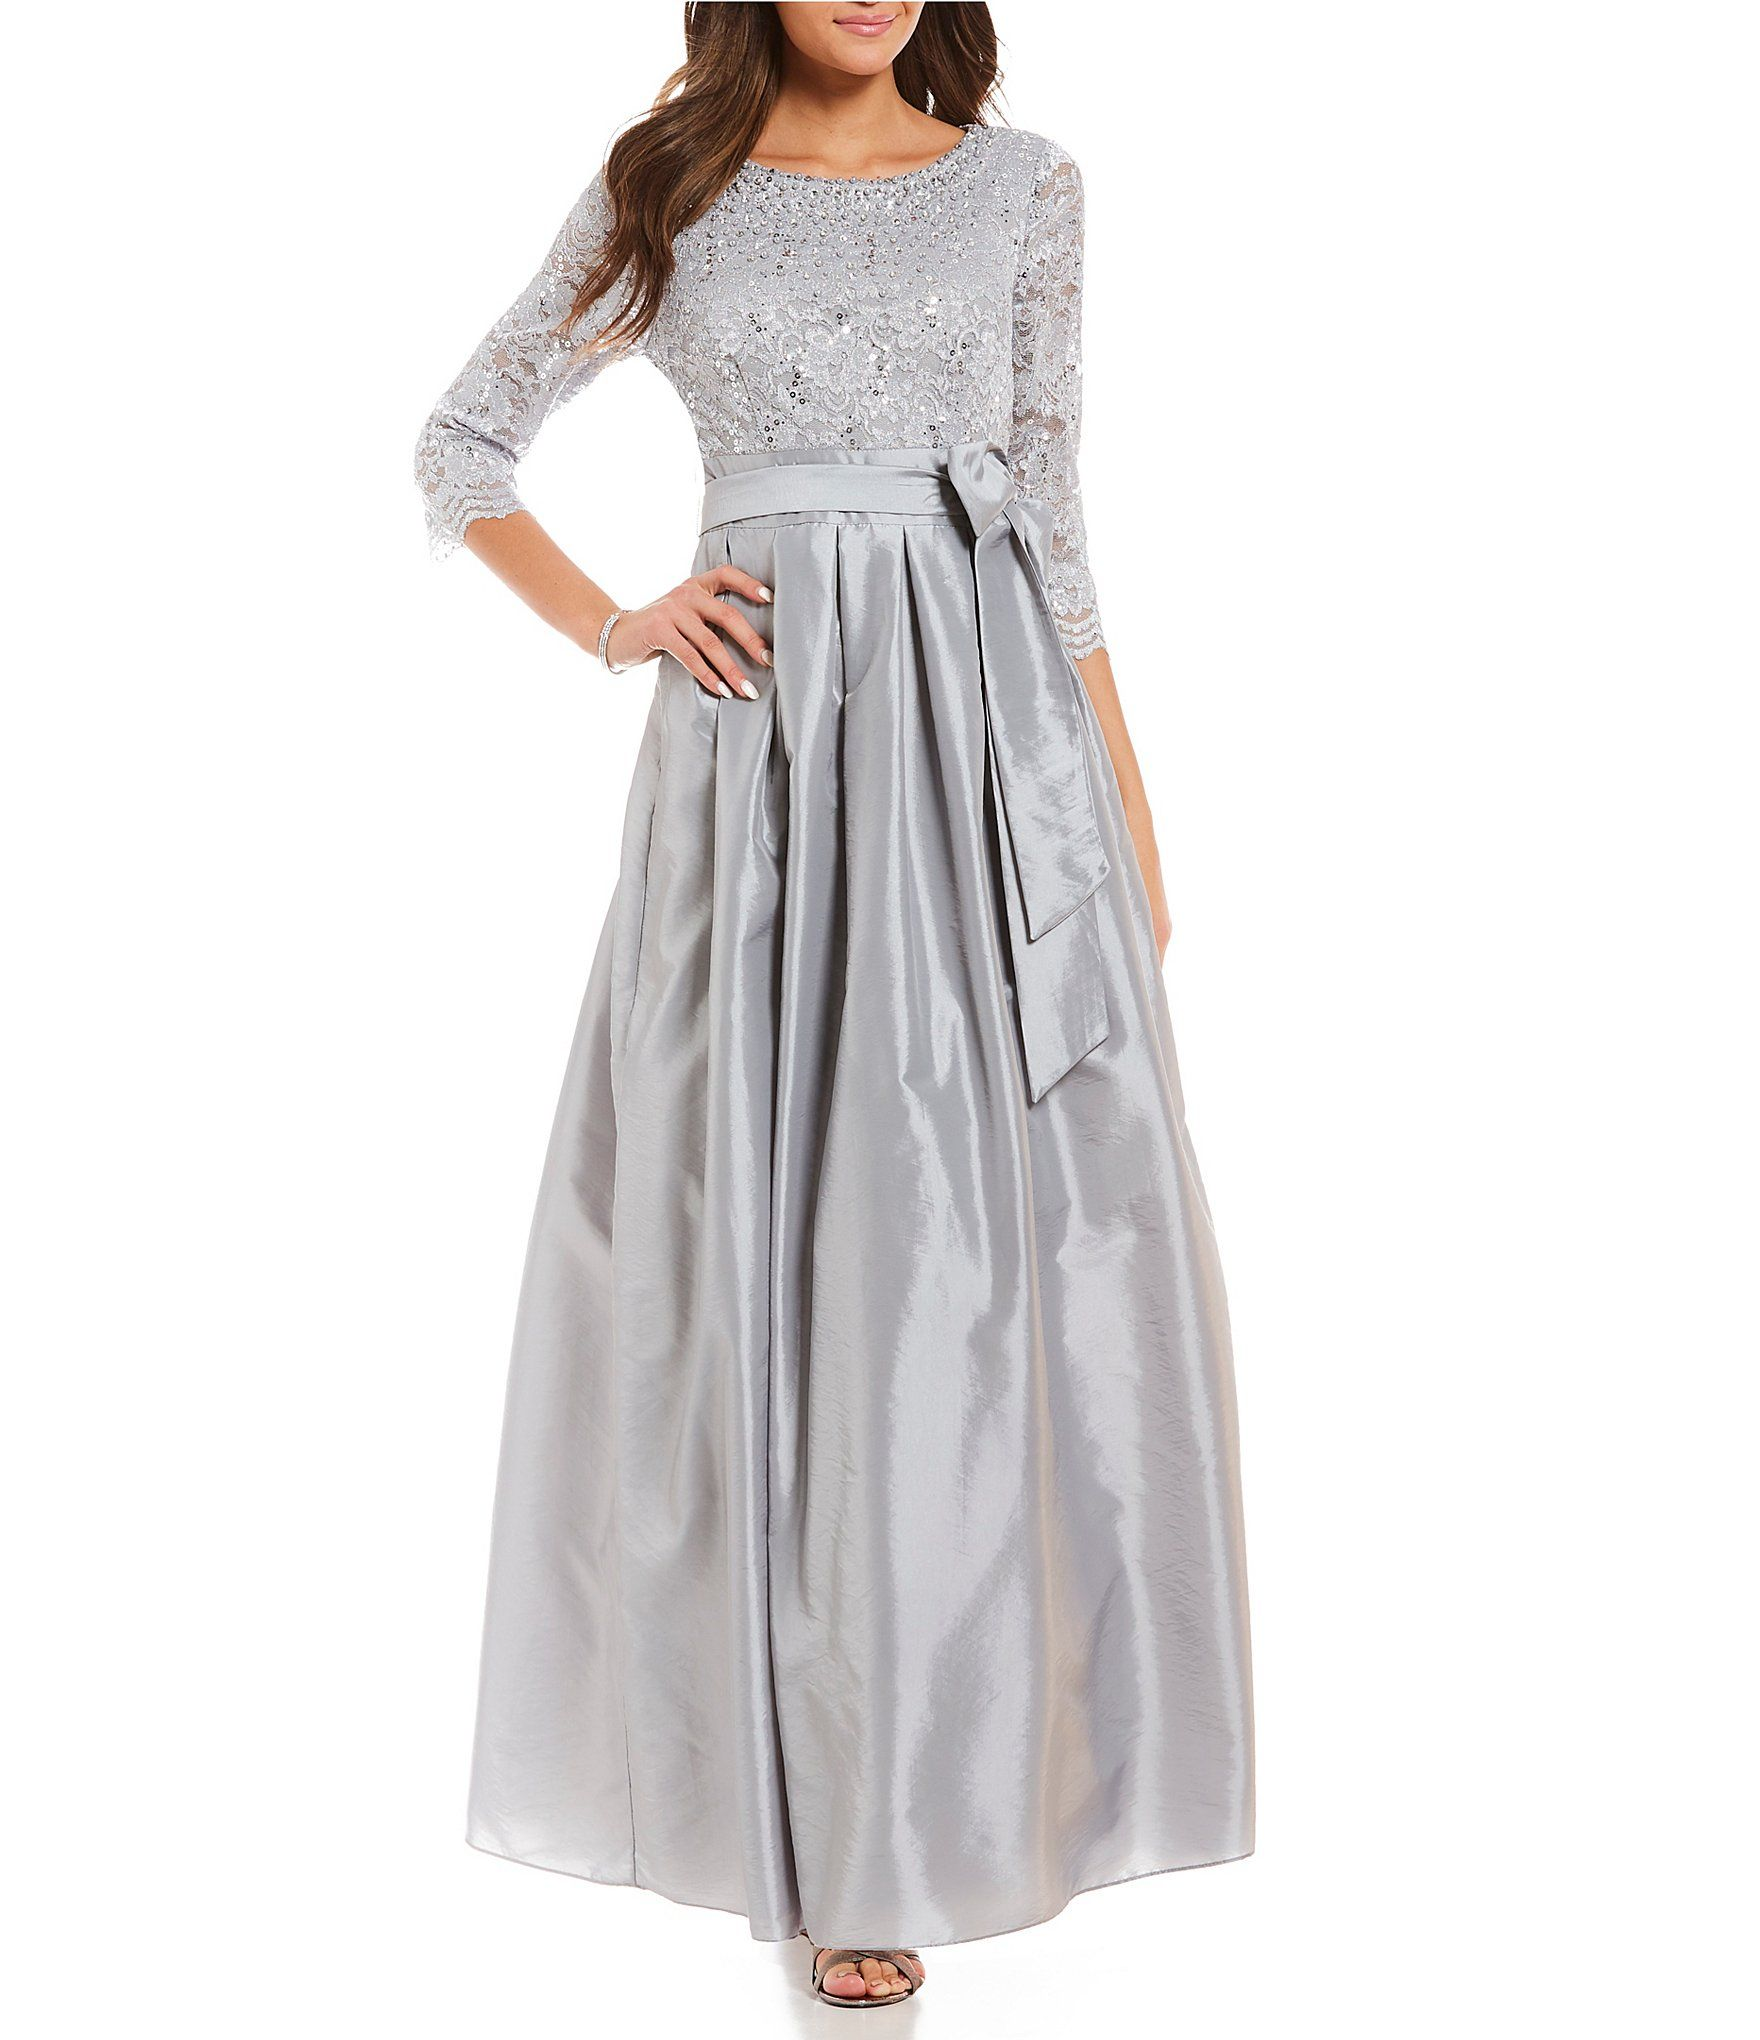 Dillards Mother of Bride Dresses Grey